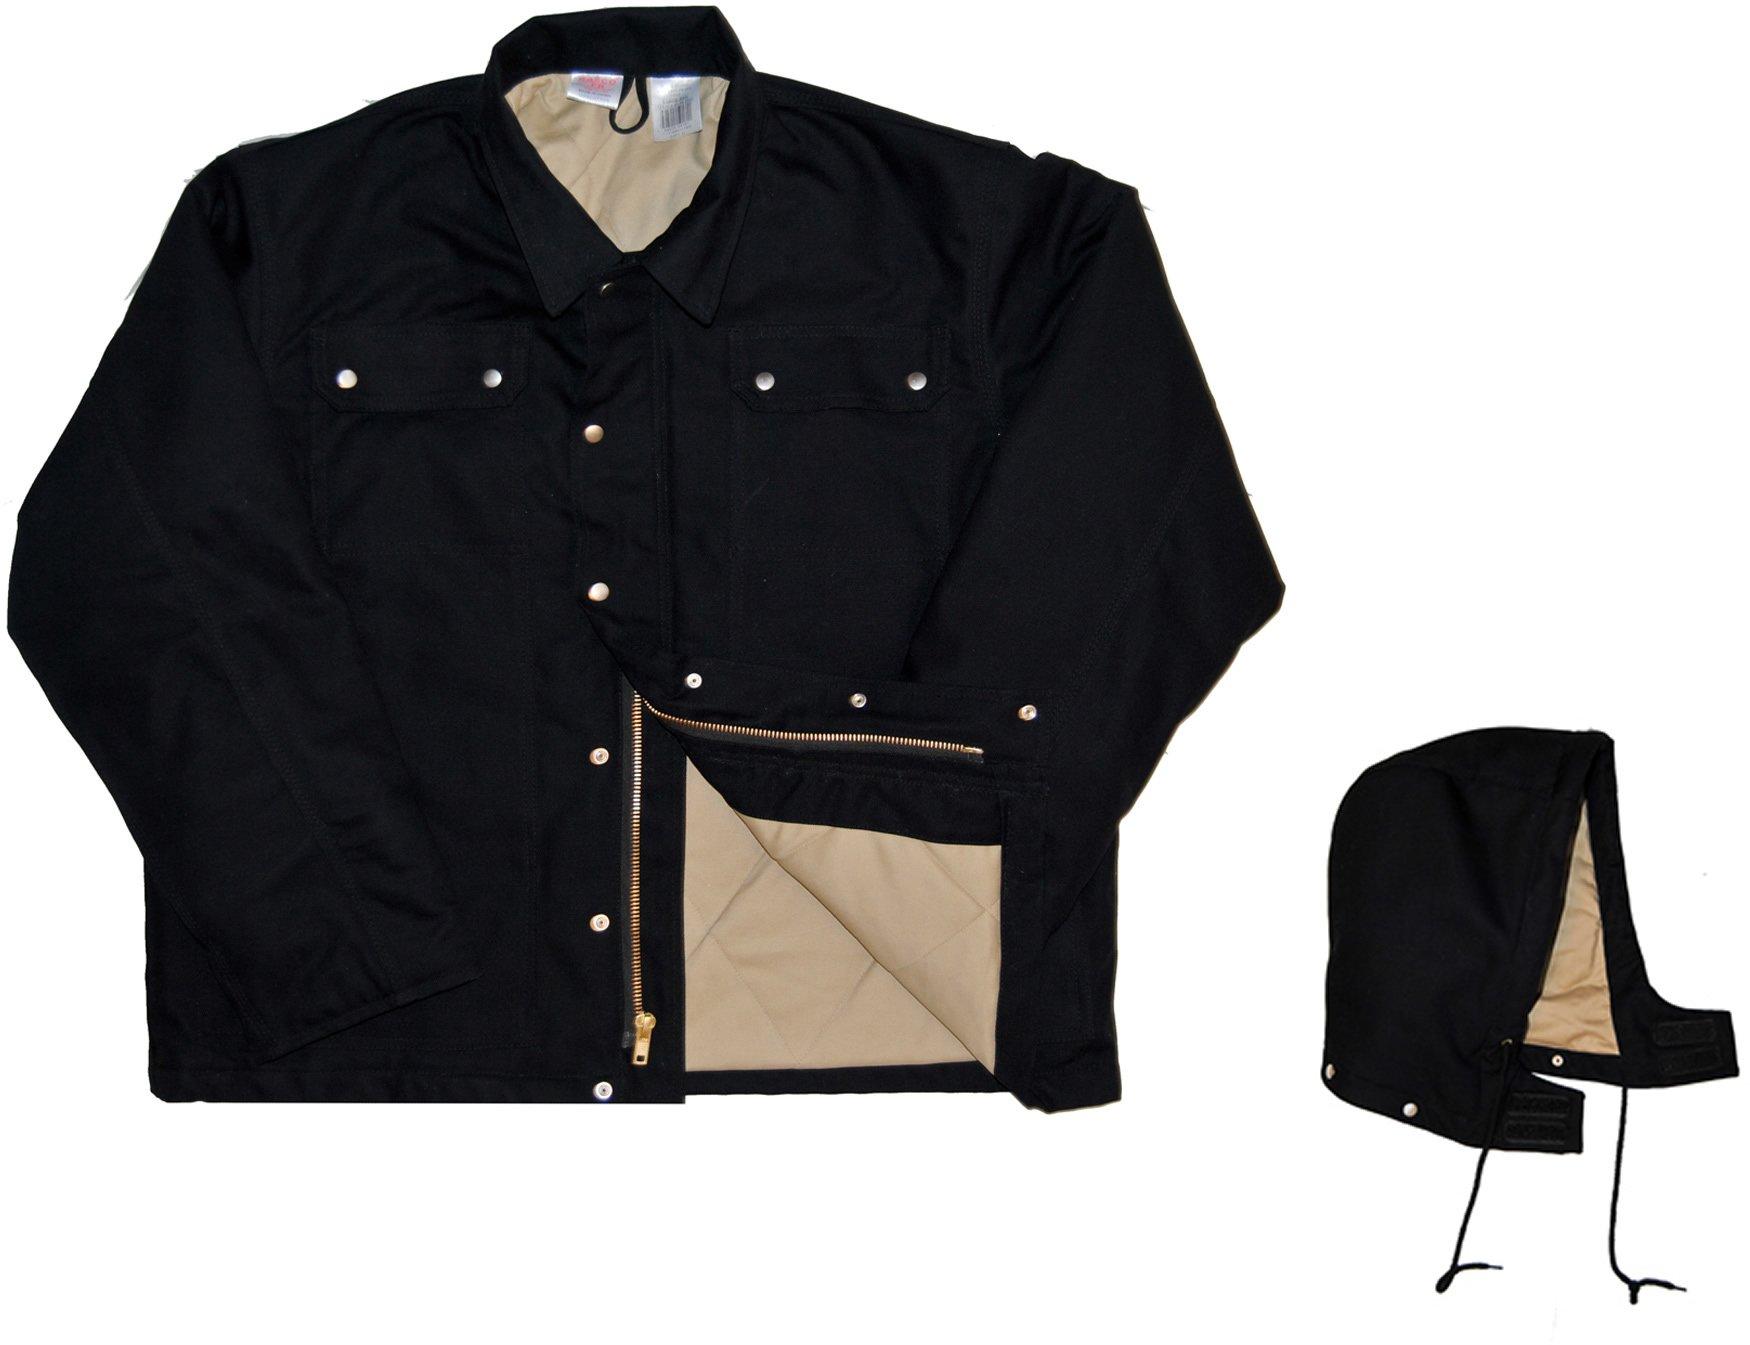 Rasco FR Heavy Black Coat with Hood BLHC2426 Flame Resistant Jacket, Black, 2X Tall